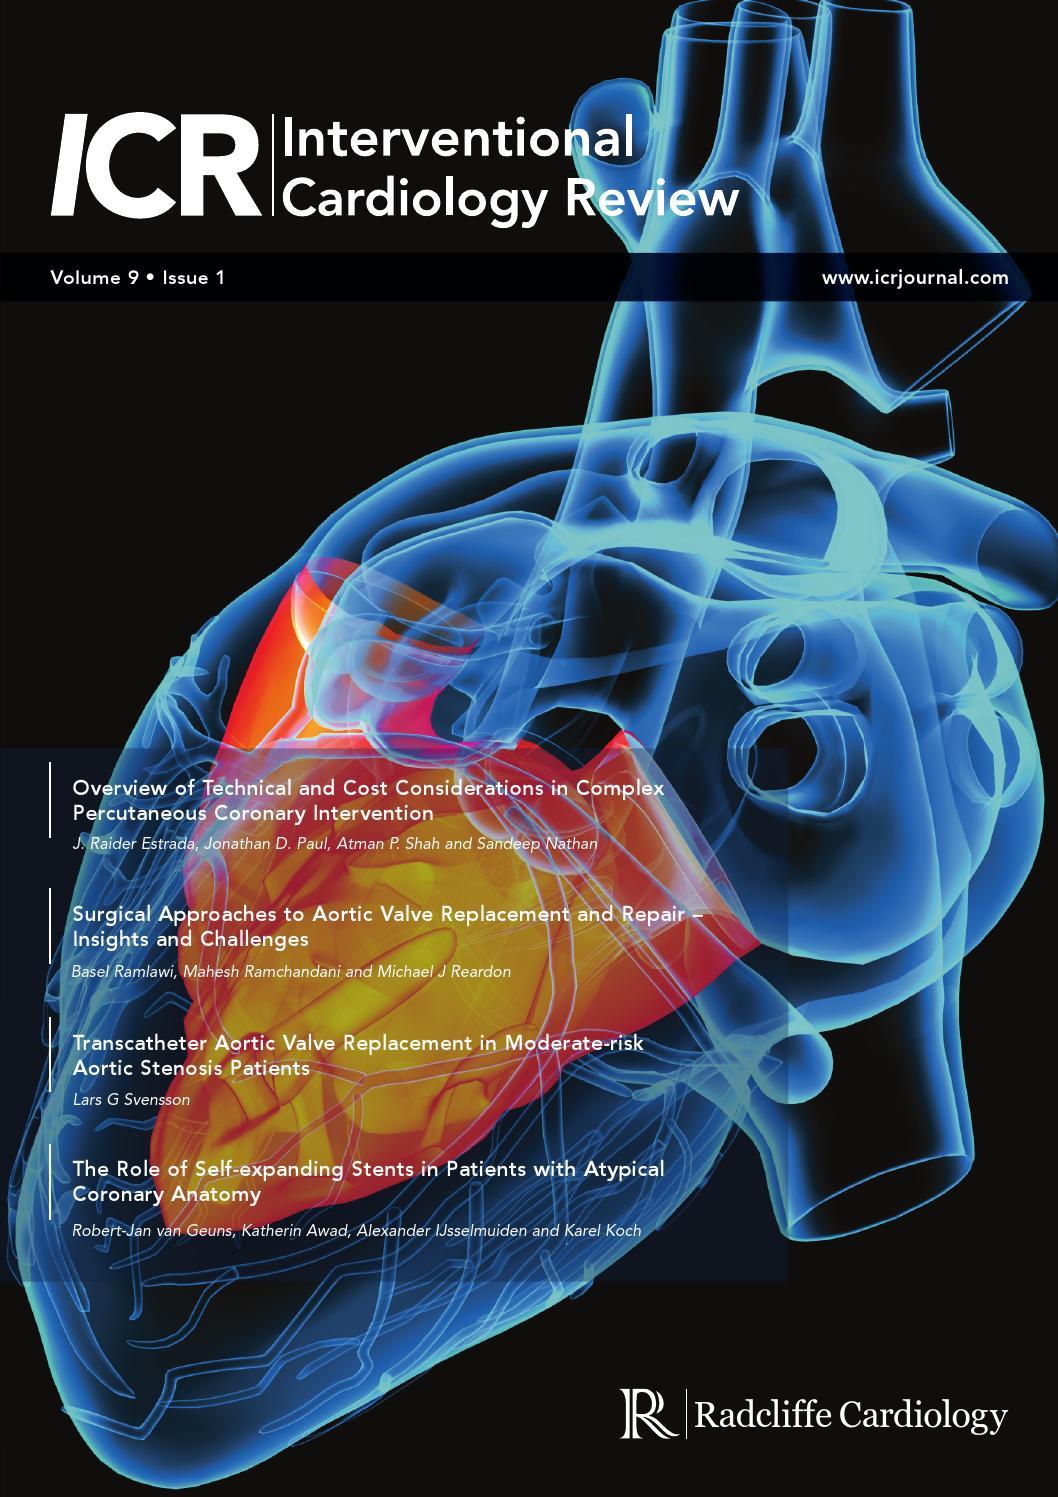 ICR 9 1 by Radcliffe Cardiology - issuu